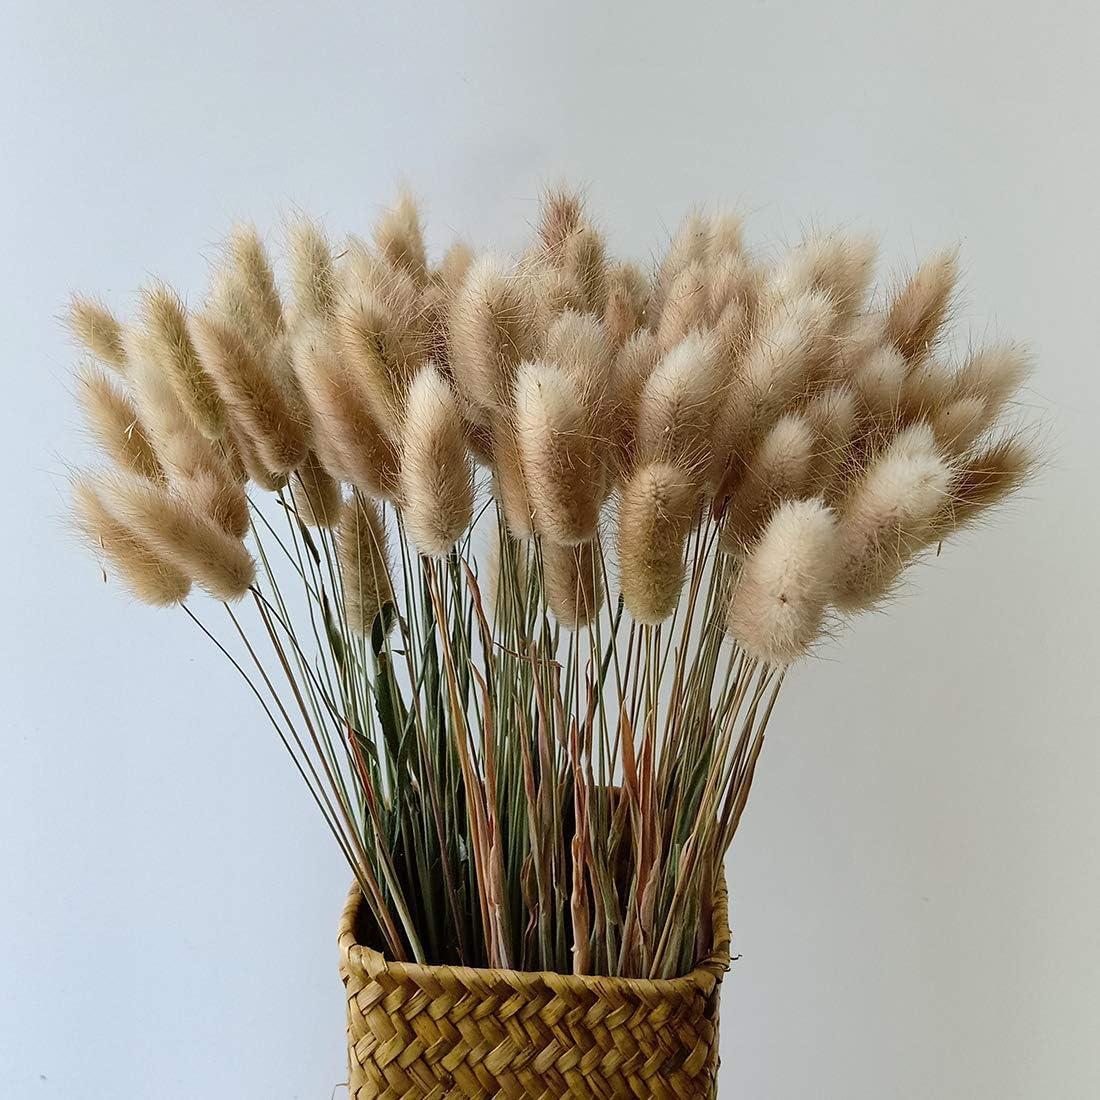 Dried Bunny Tail Grass Lagurus Grass Dried Flower Bouquet Decorative Feathers